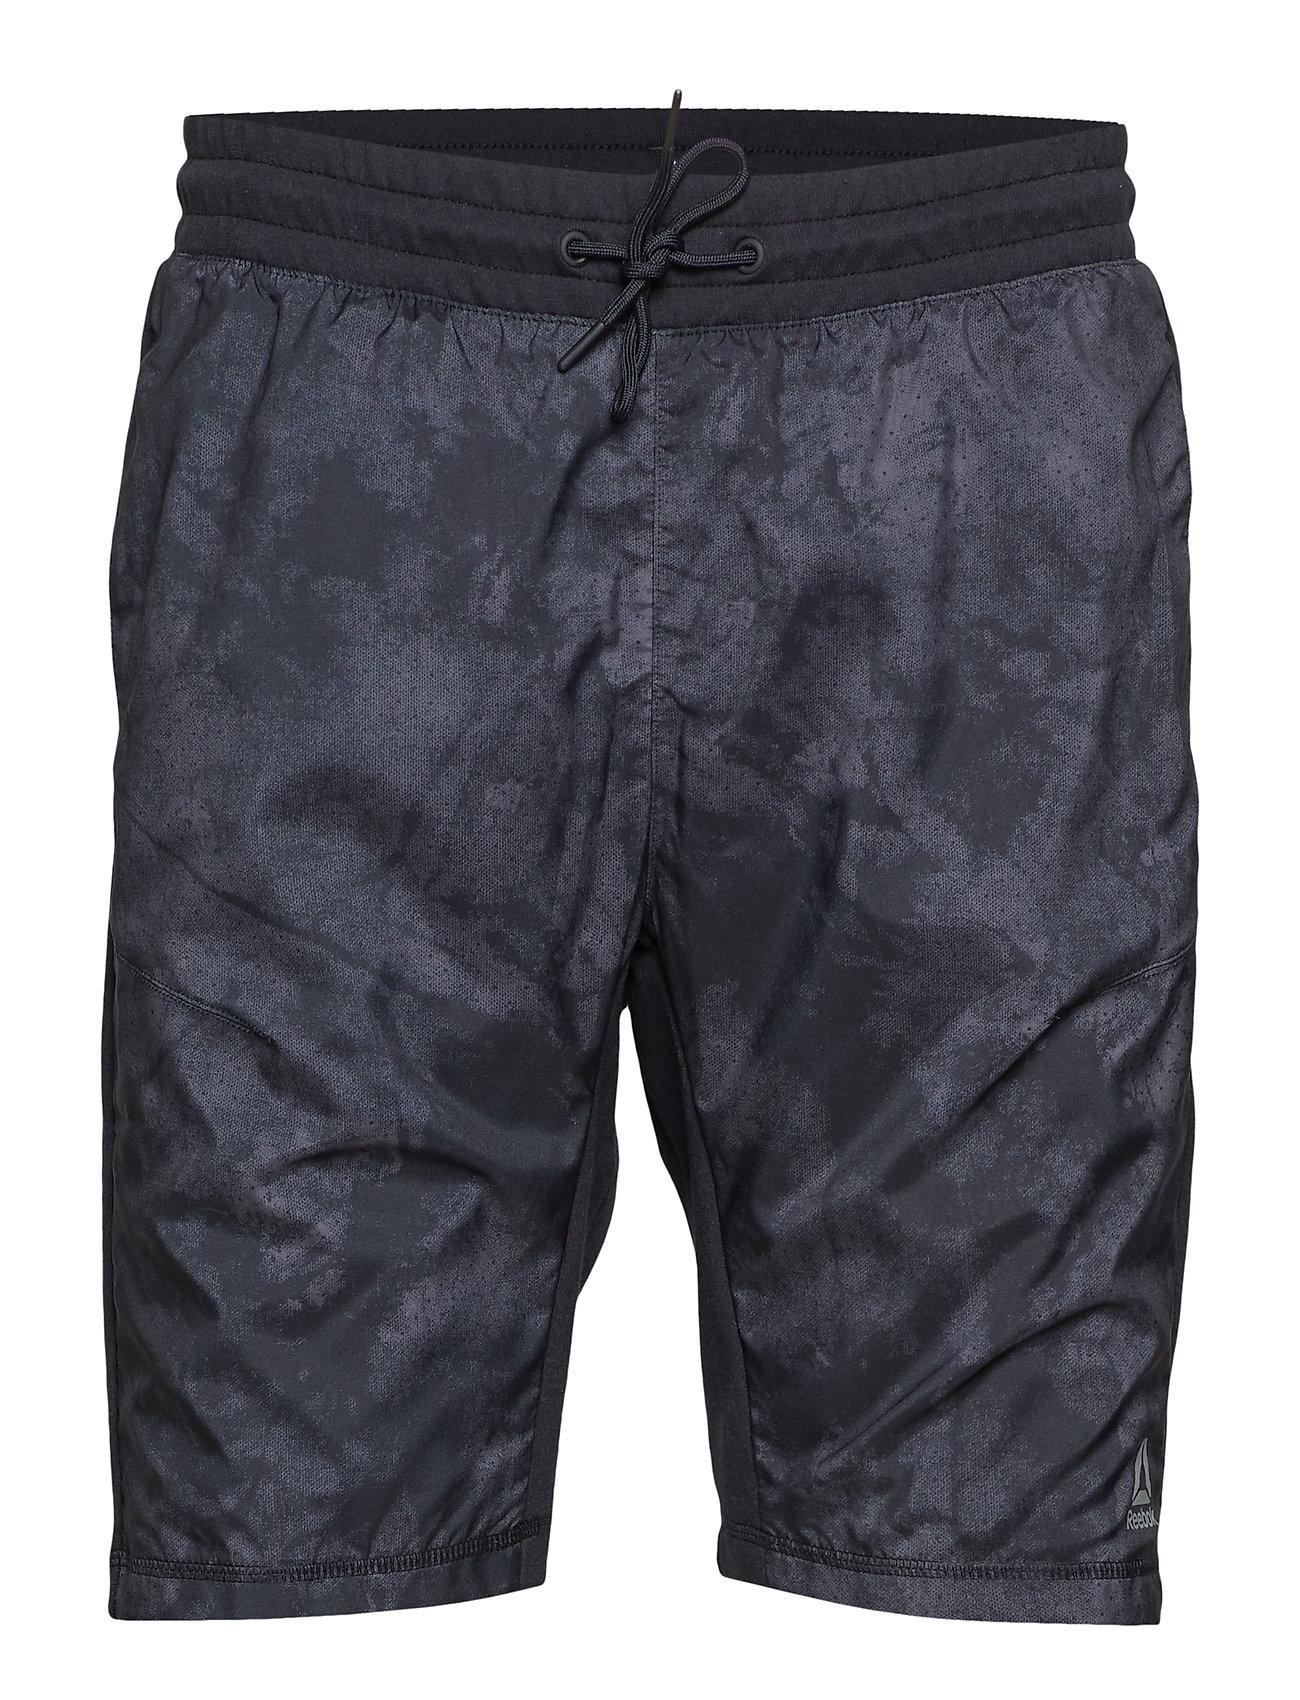 Reebok Performance TE Knit-Woven Short - BLACK